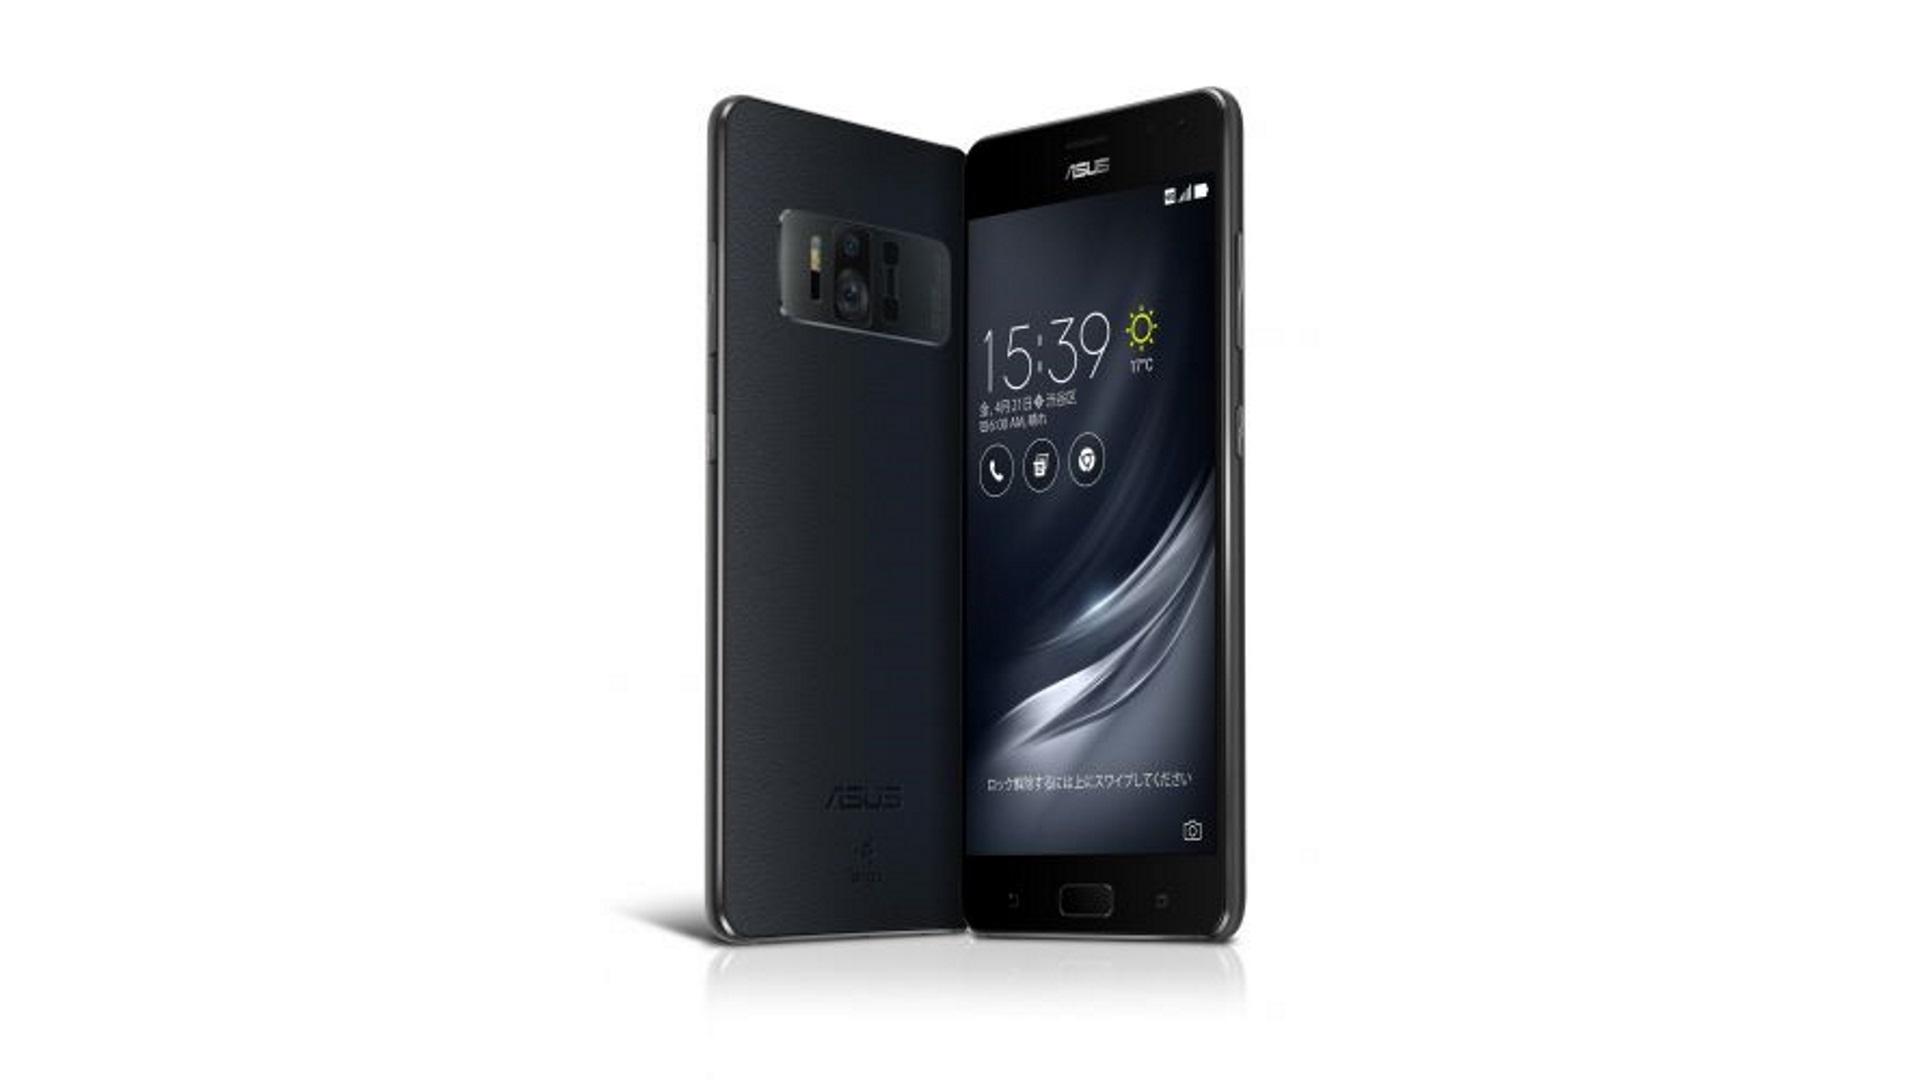 国内版「ZenFone AR」は6月23日発売、予約開始